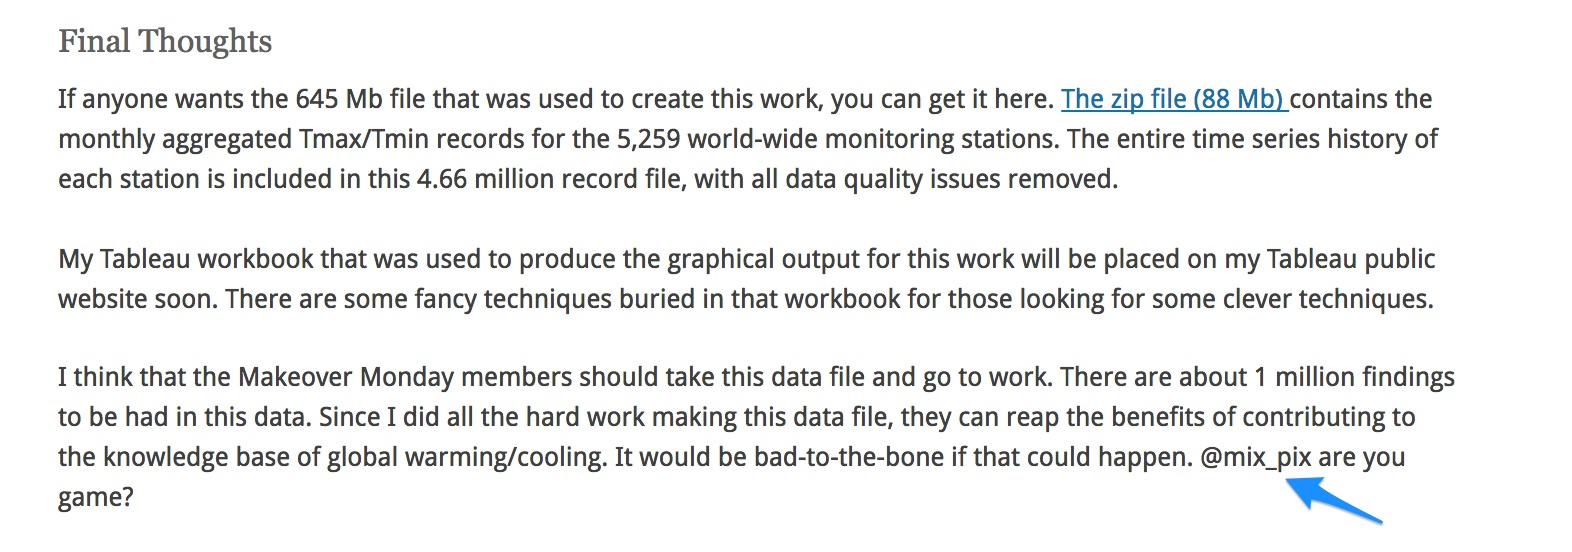 bringing google forms data into tableau pixel mixer